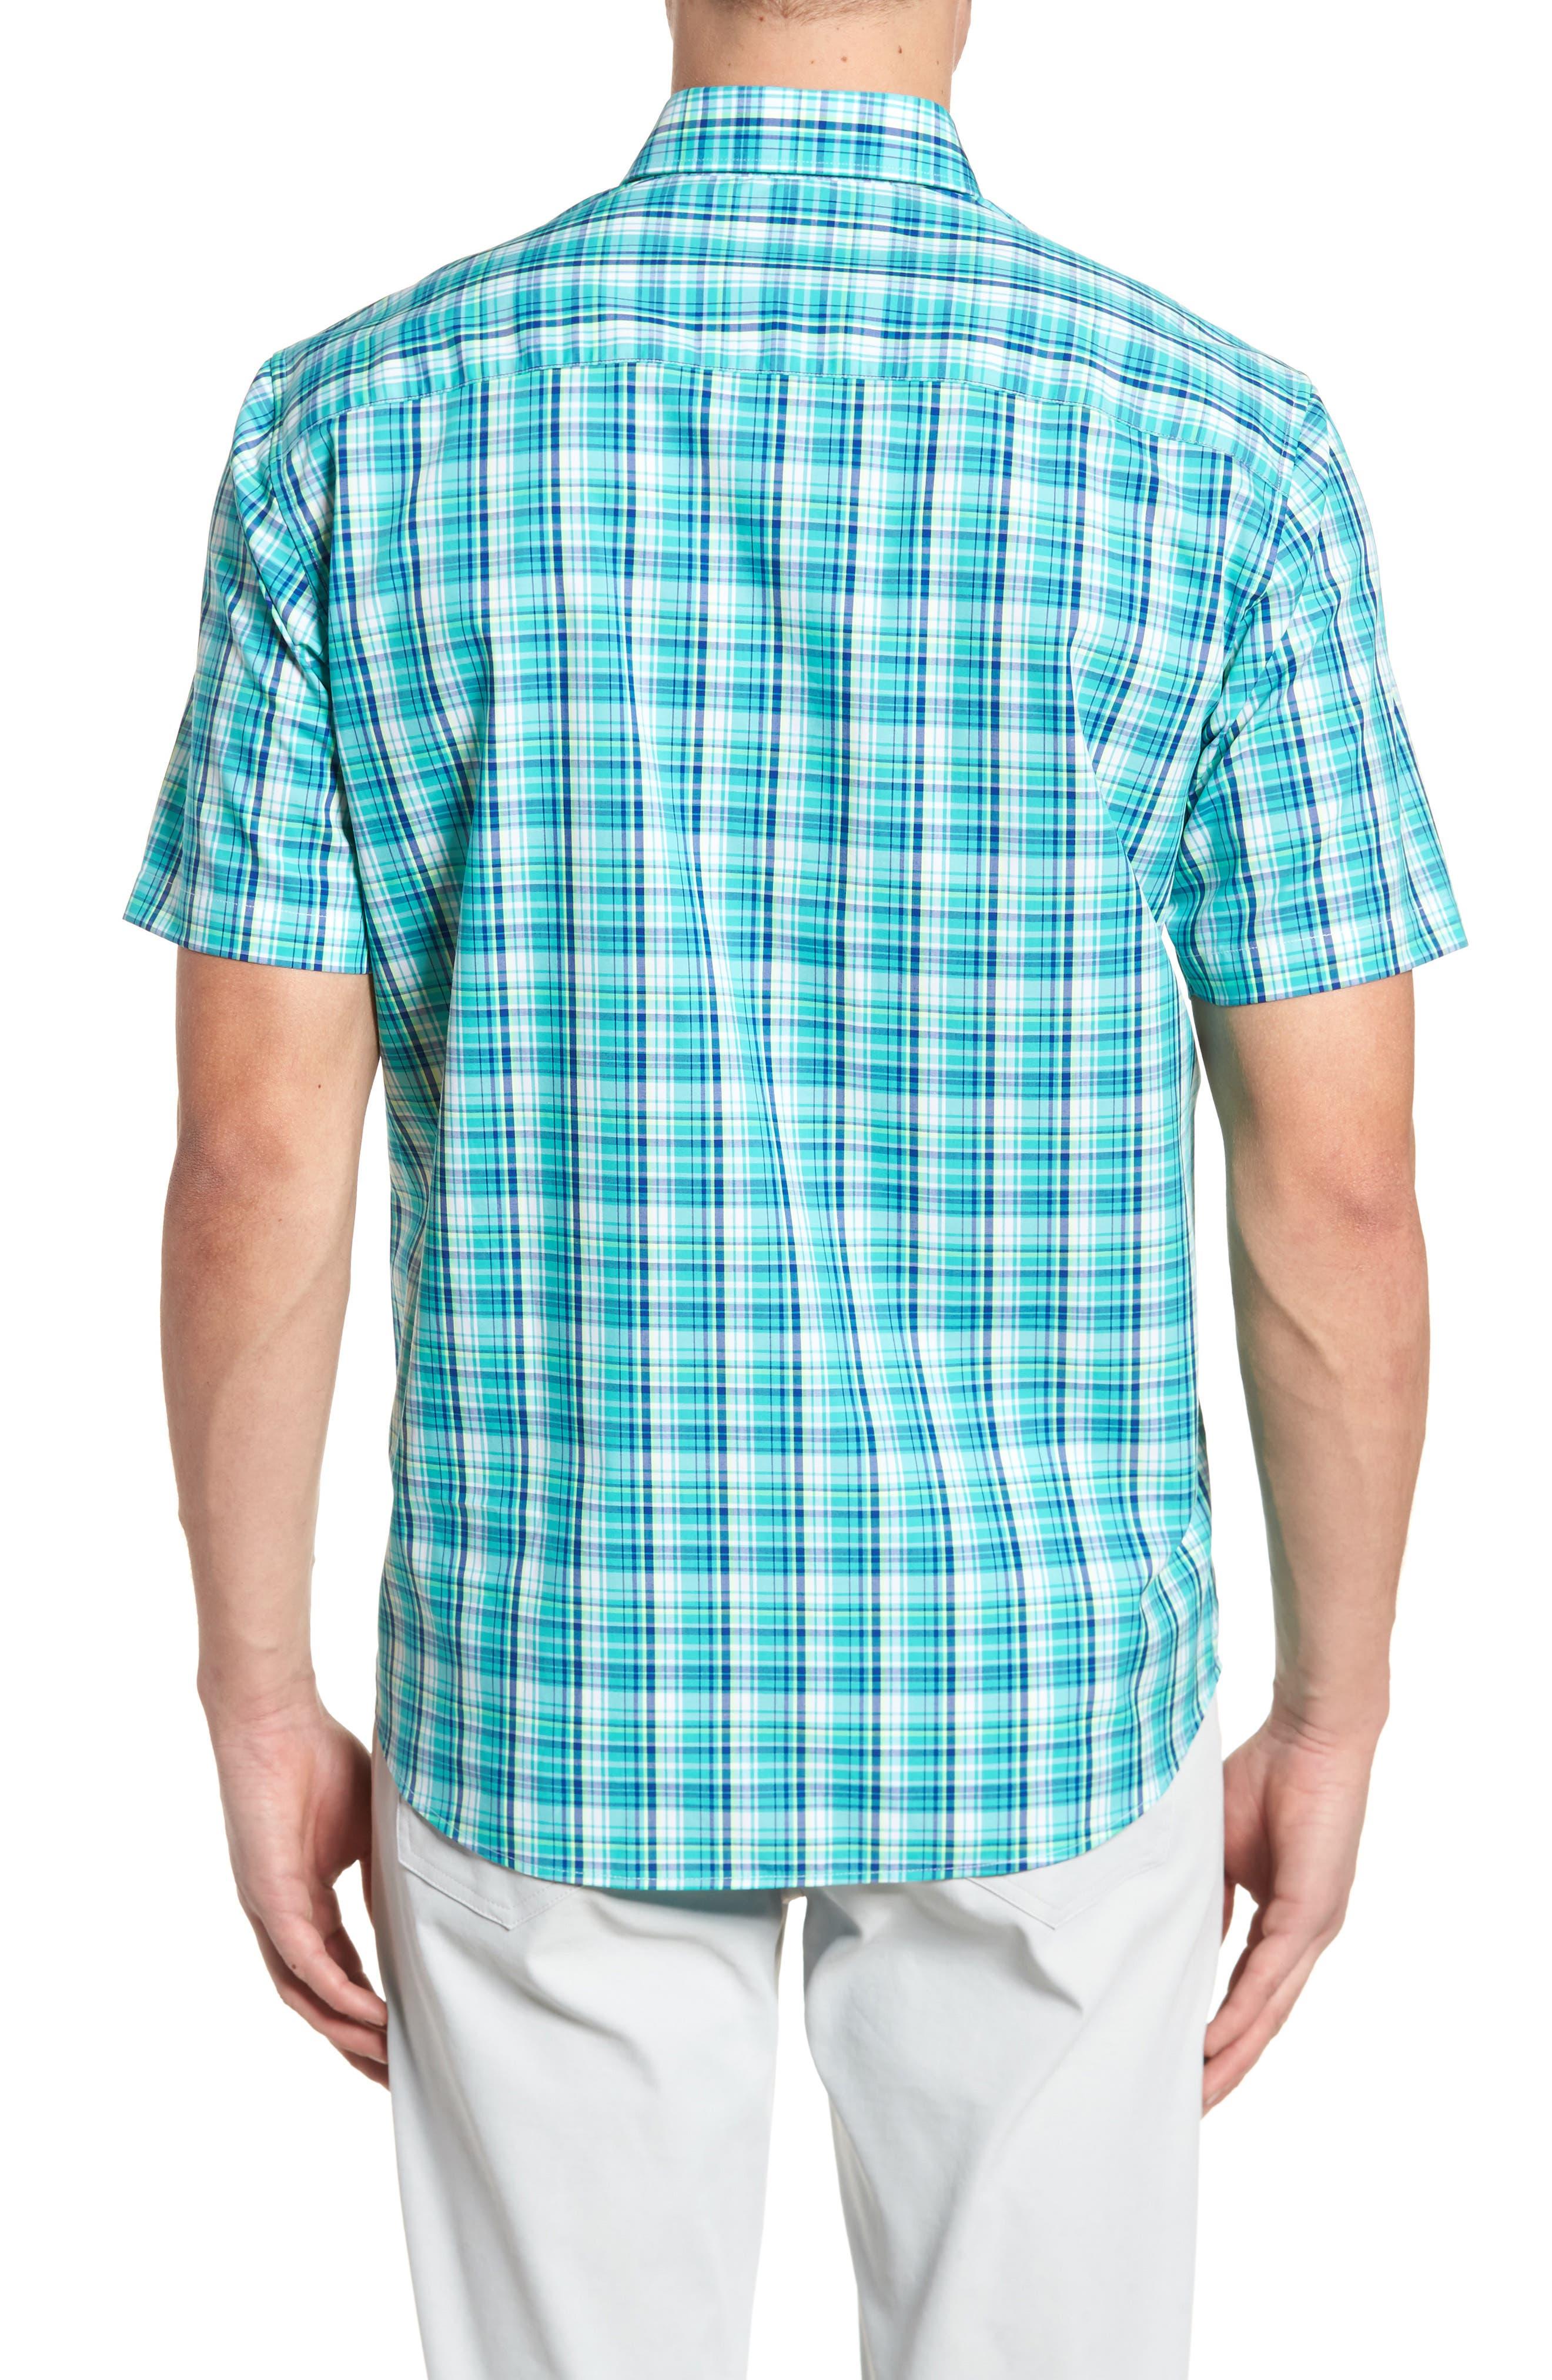 Tobias Non-Iron Plaid Woven Shirt,                             Alternate thumbnail 2, color,                             Newport